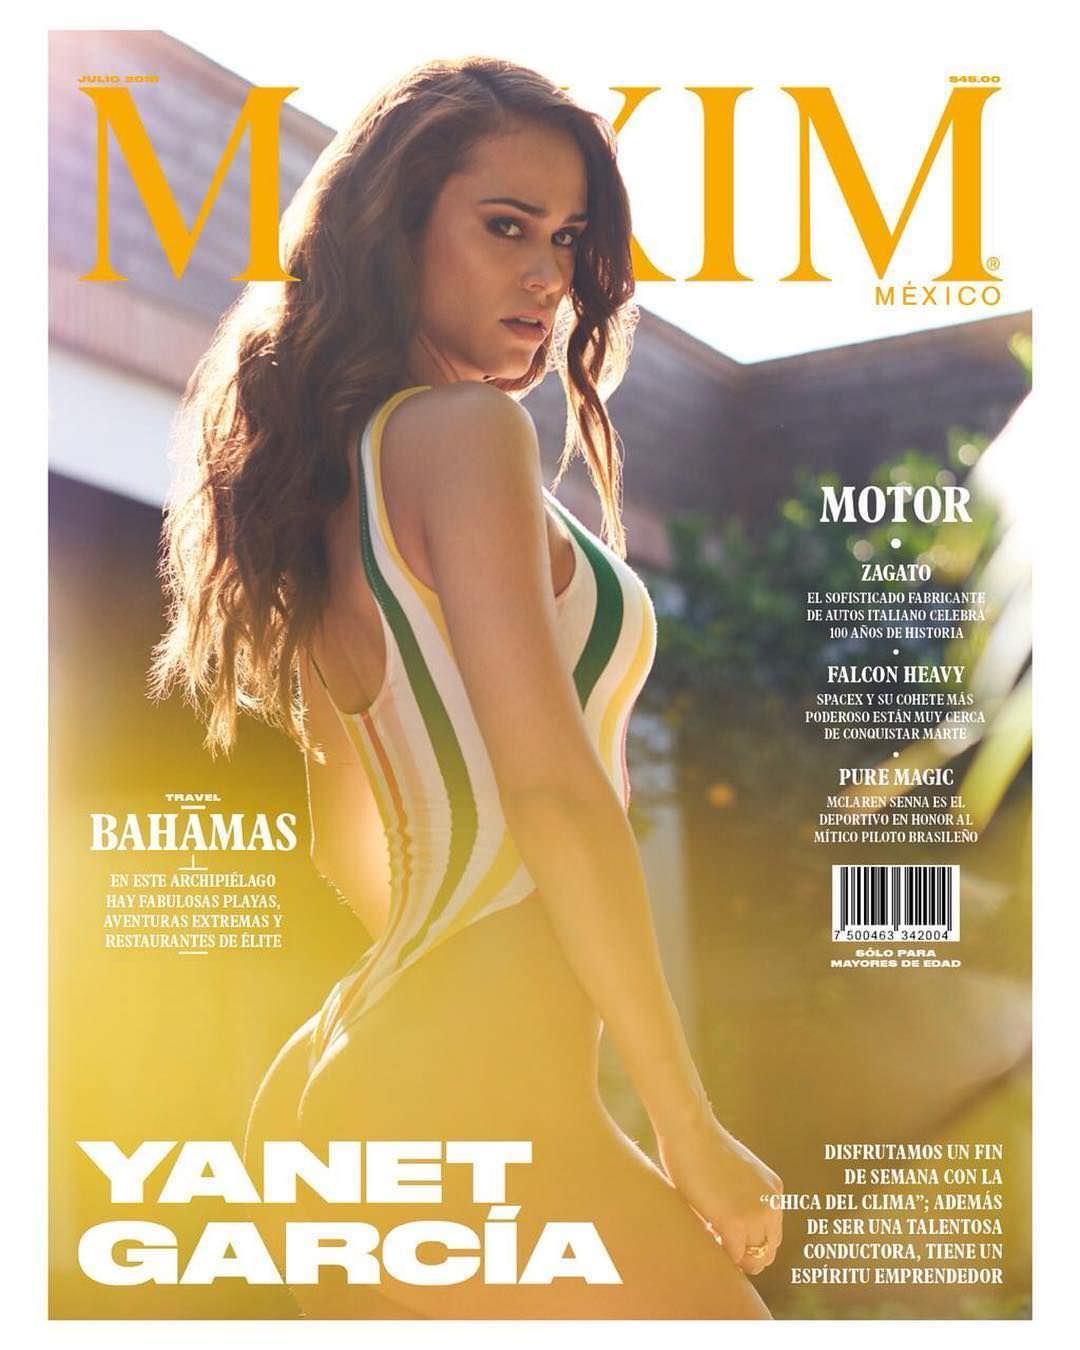 Янет Гарсия фото для обложки журнала Maxim